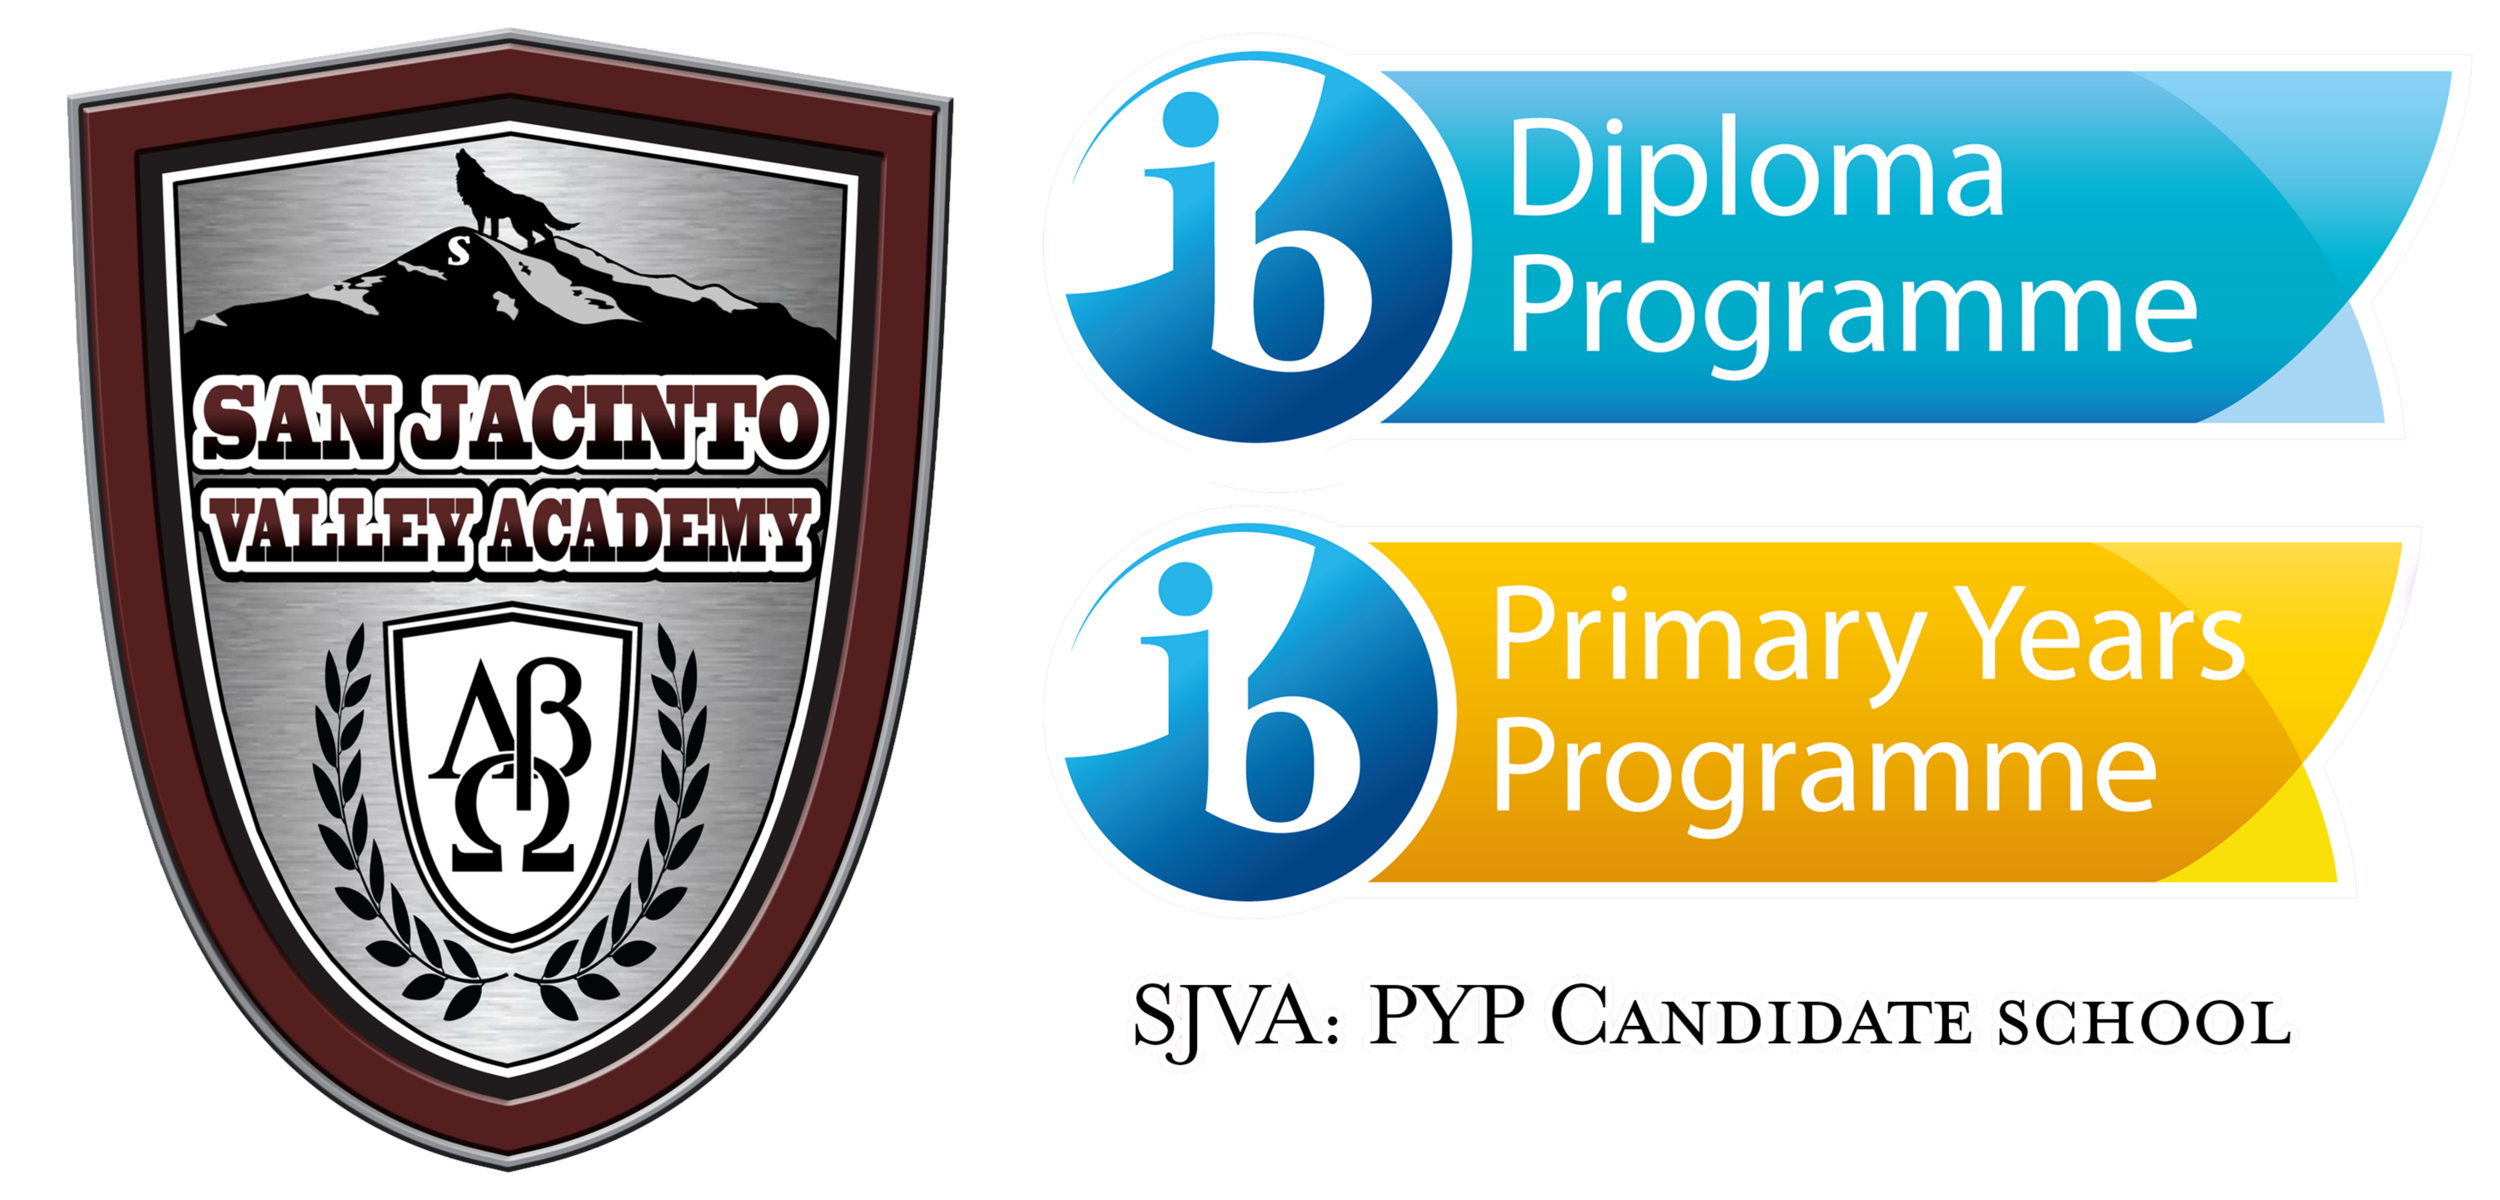 SJVA Logo With IB Large v3 in-line.png